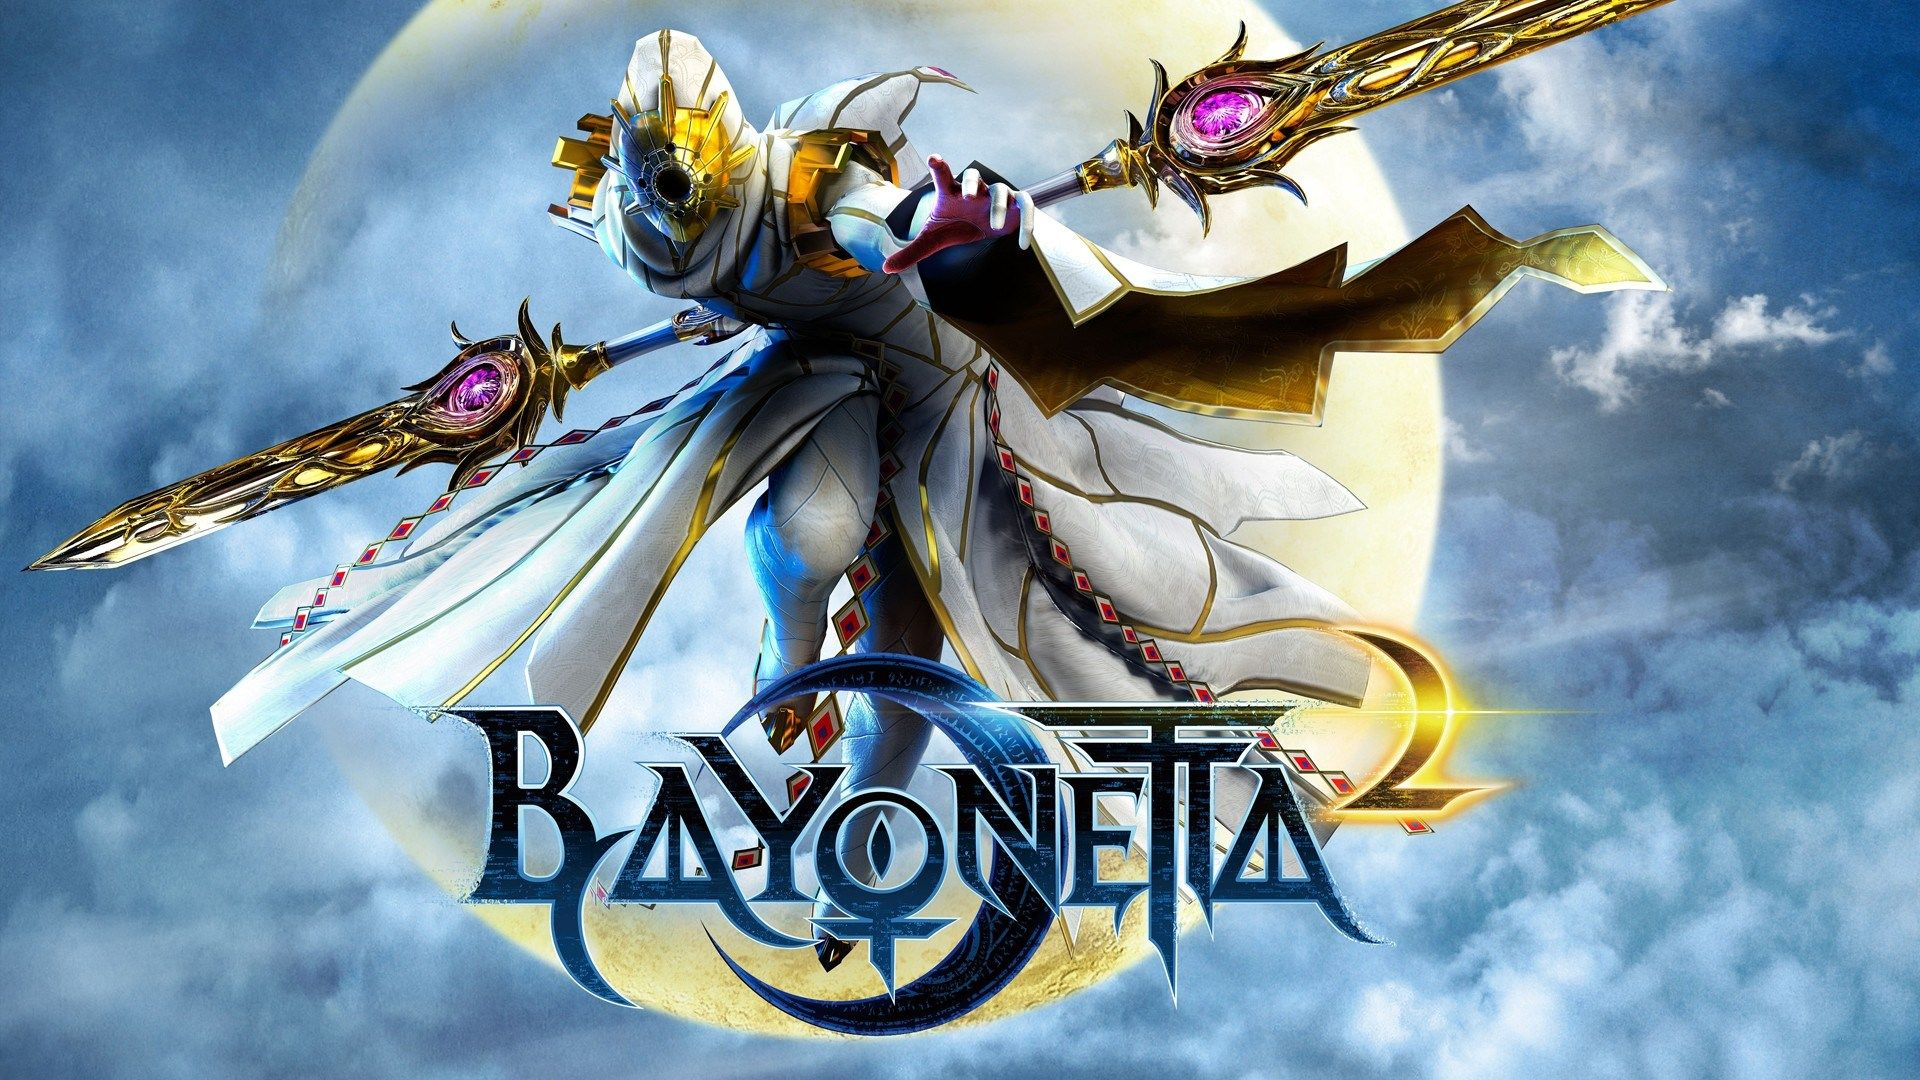 Wallpaper Images Bayonetta 2 526 Kb Dee Bush Bayonetta Art Art Gallery